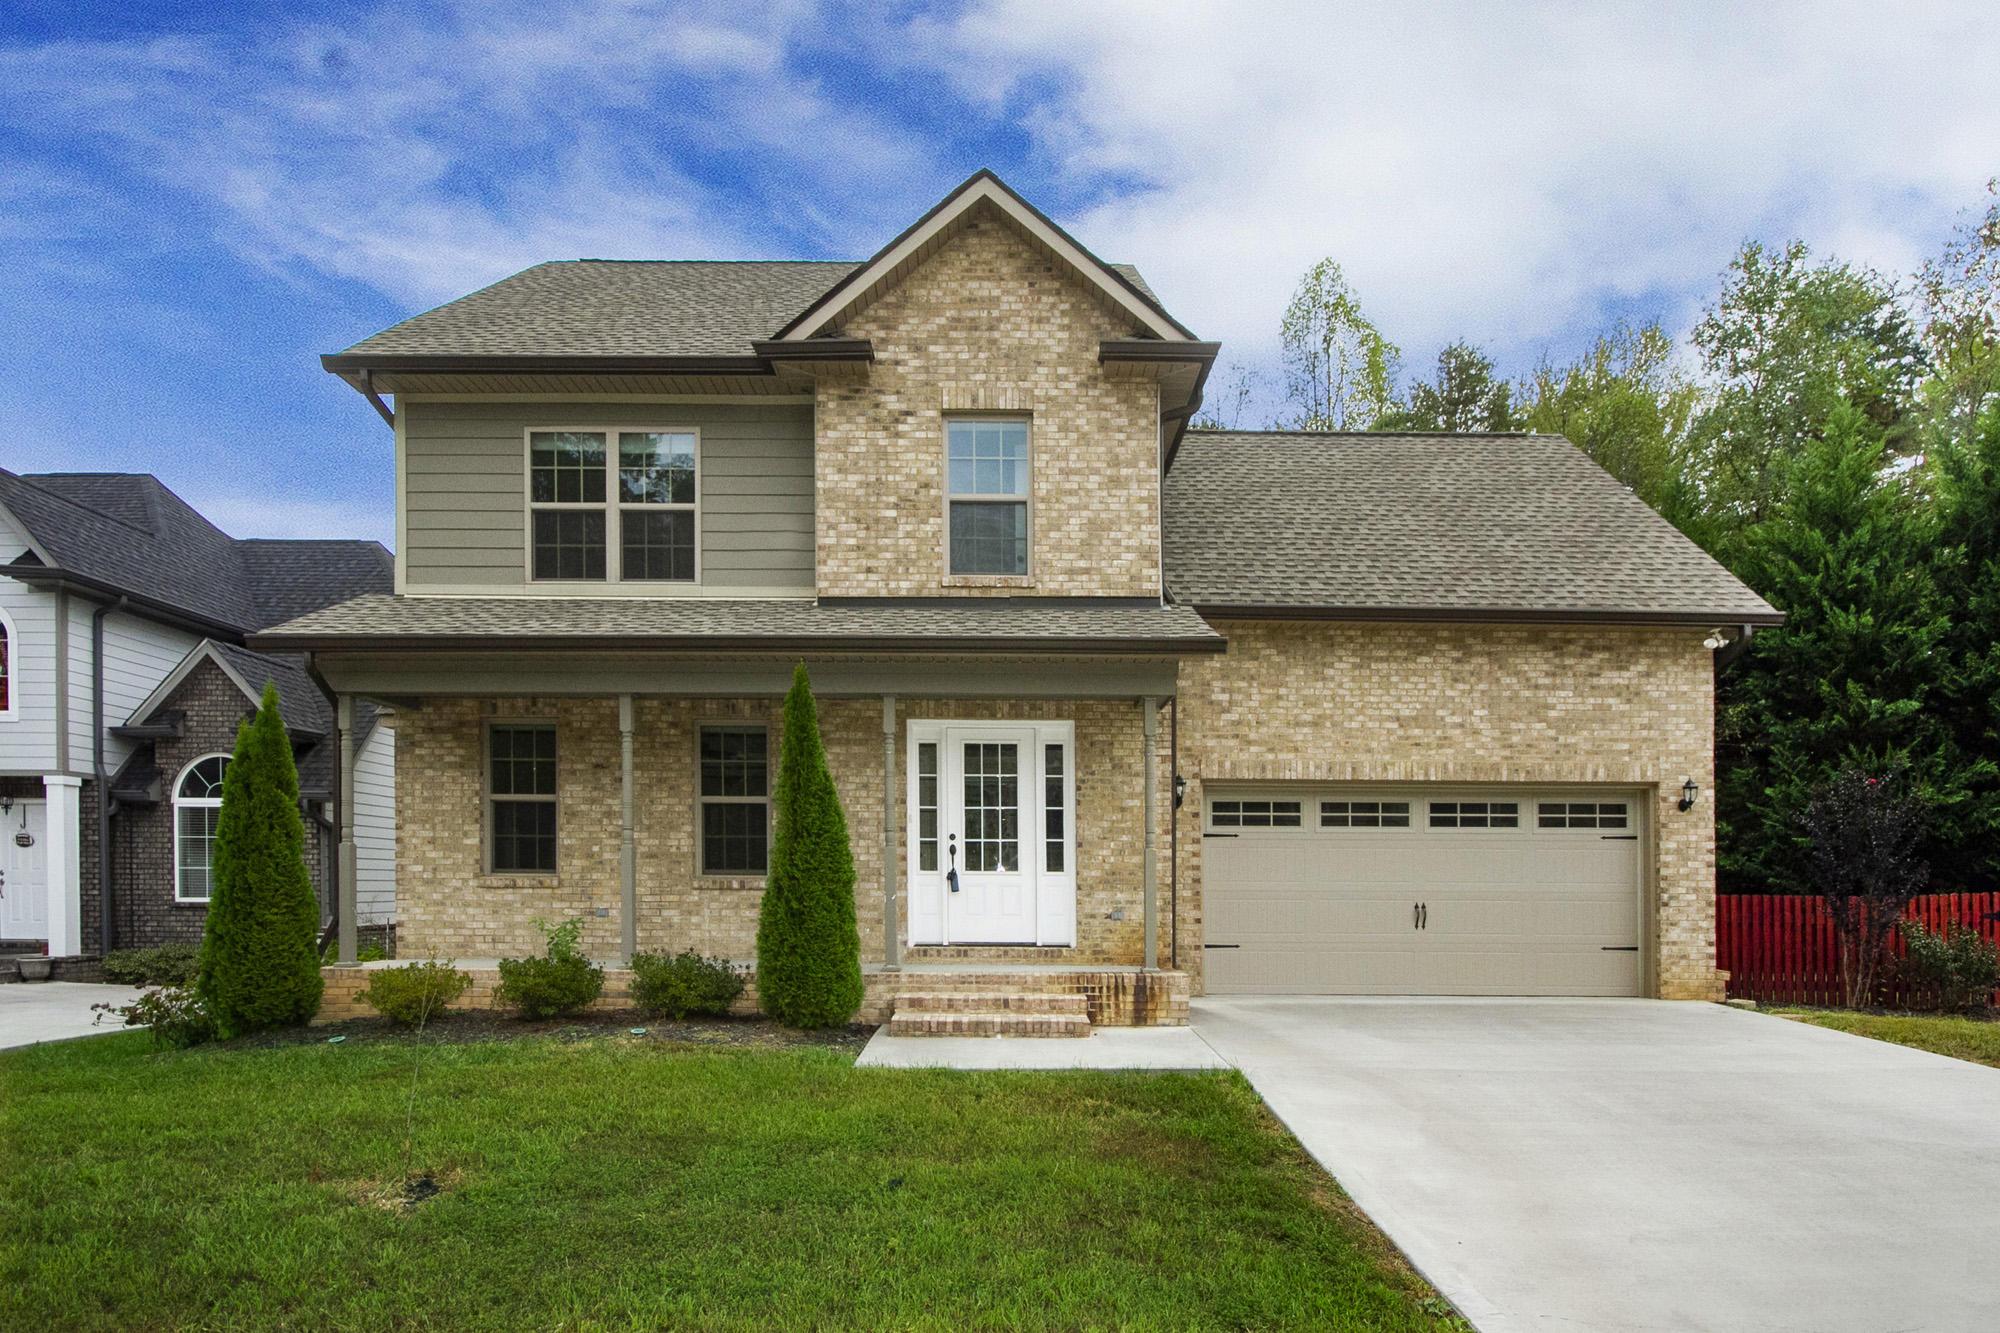 100 Crossroads Blvd, Oak Ridge, Tennessee 37830, 3 Bedrooms Bedrooms, ,2 BathroomsBathrooms,Single Family,For Sale,Crossroads,1097987